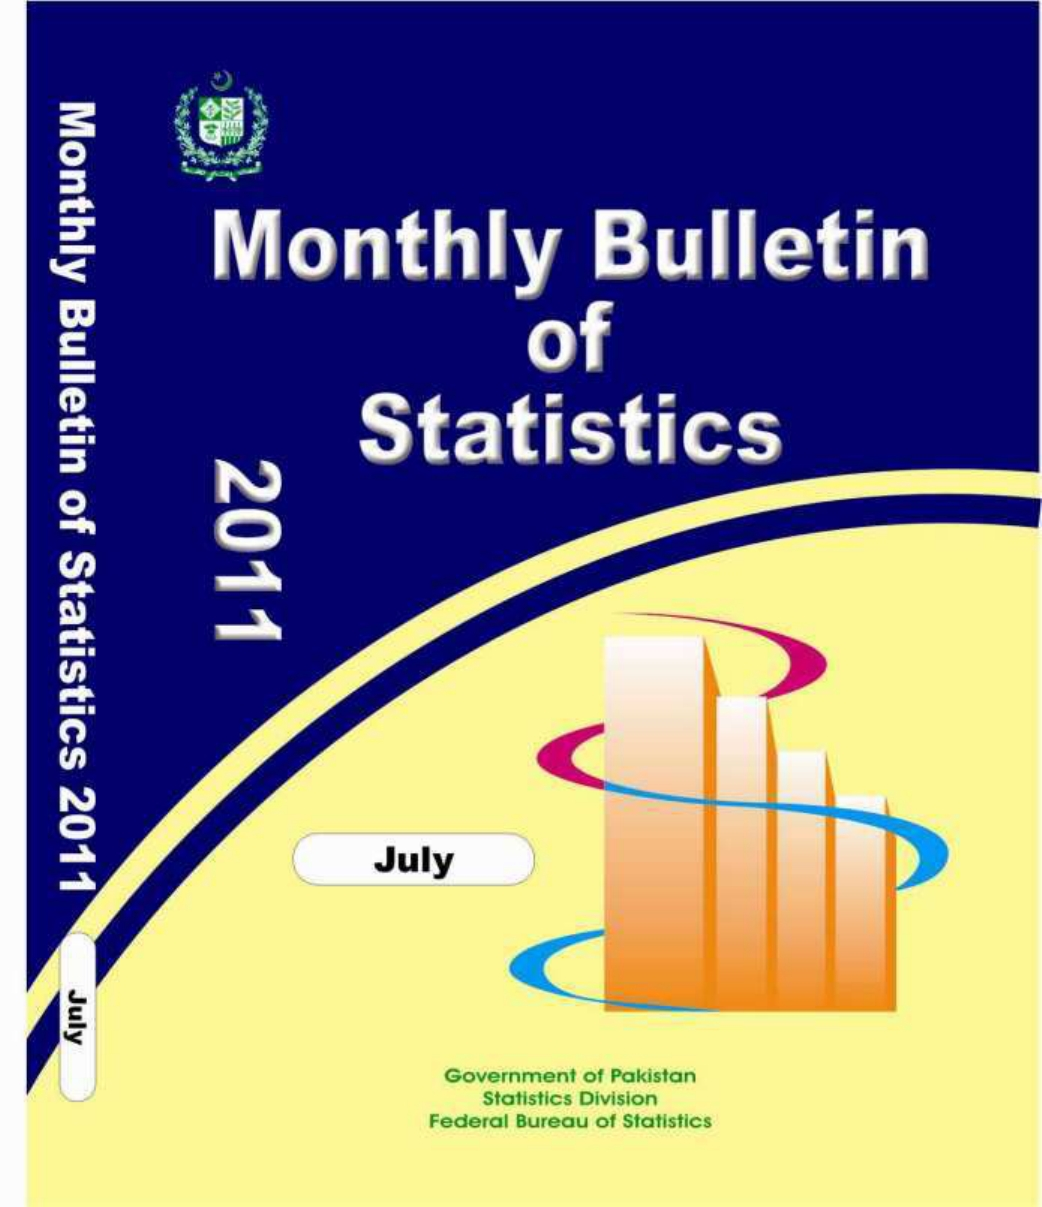 Monthly Bulletin Of Statistics, July 2011 | Manualzz